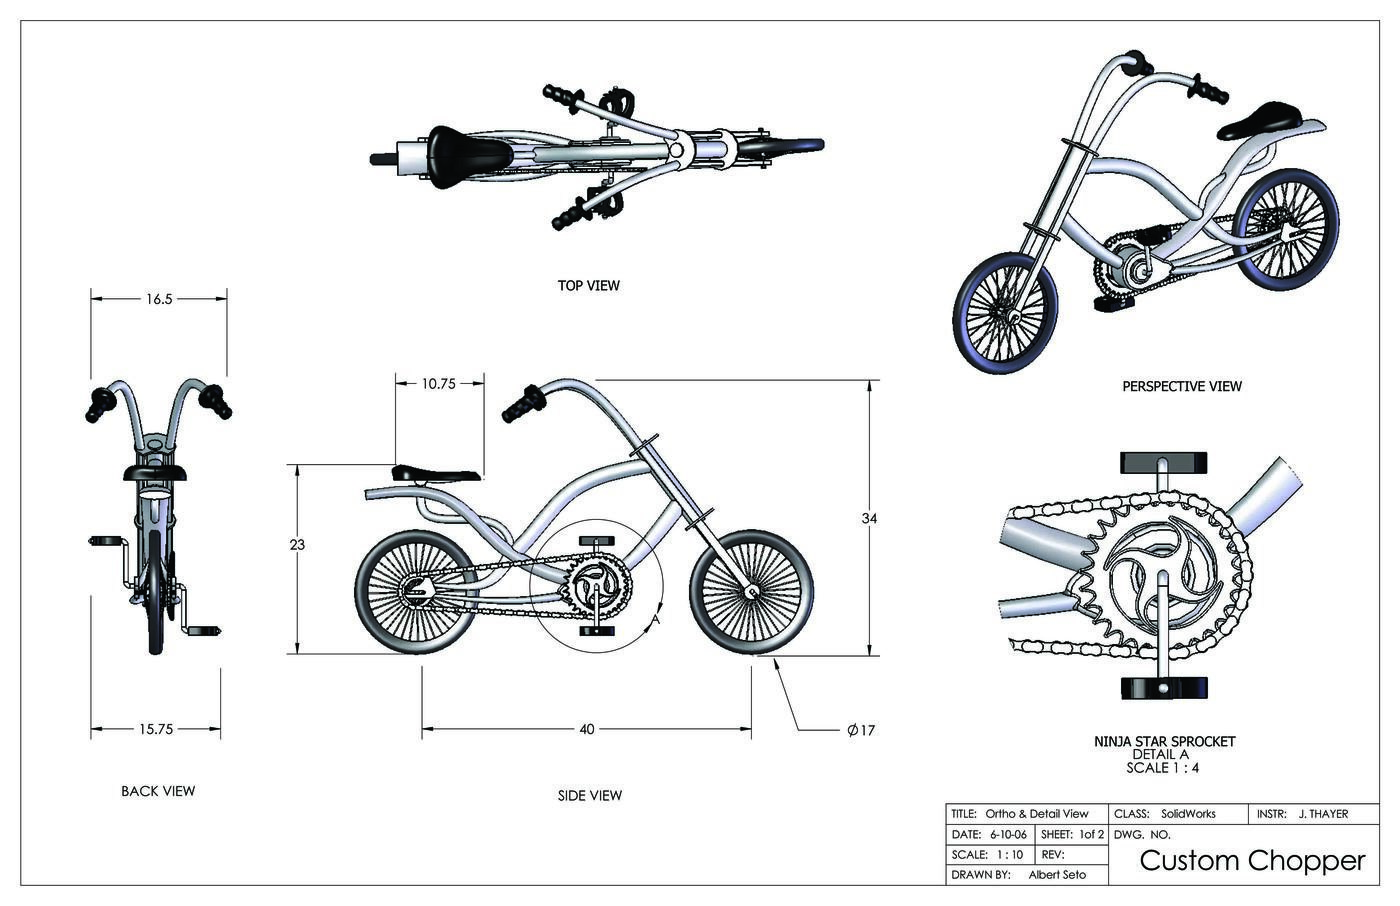 computer aided drawings by   seto   at coroflot com